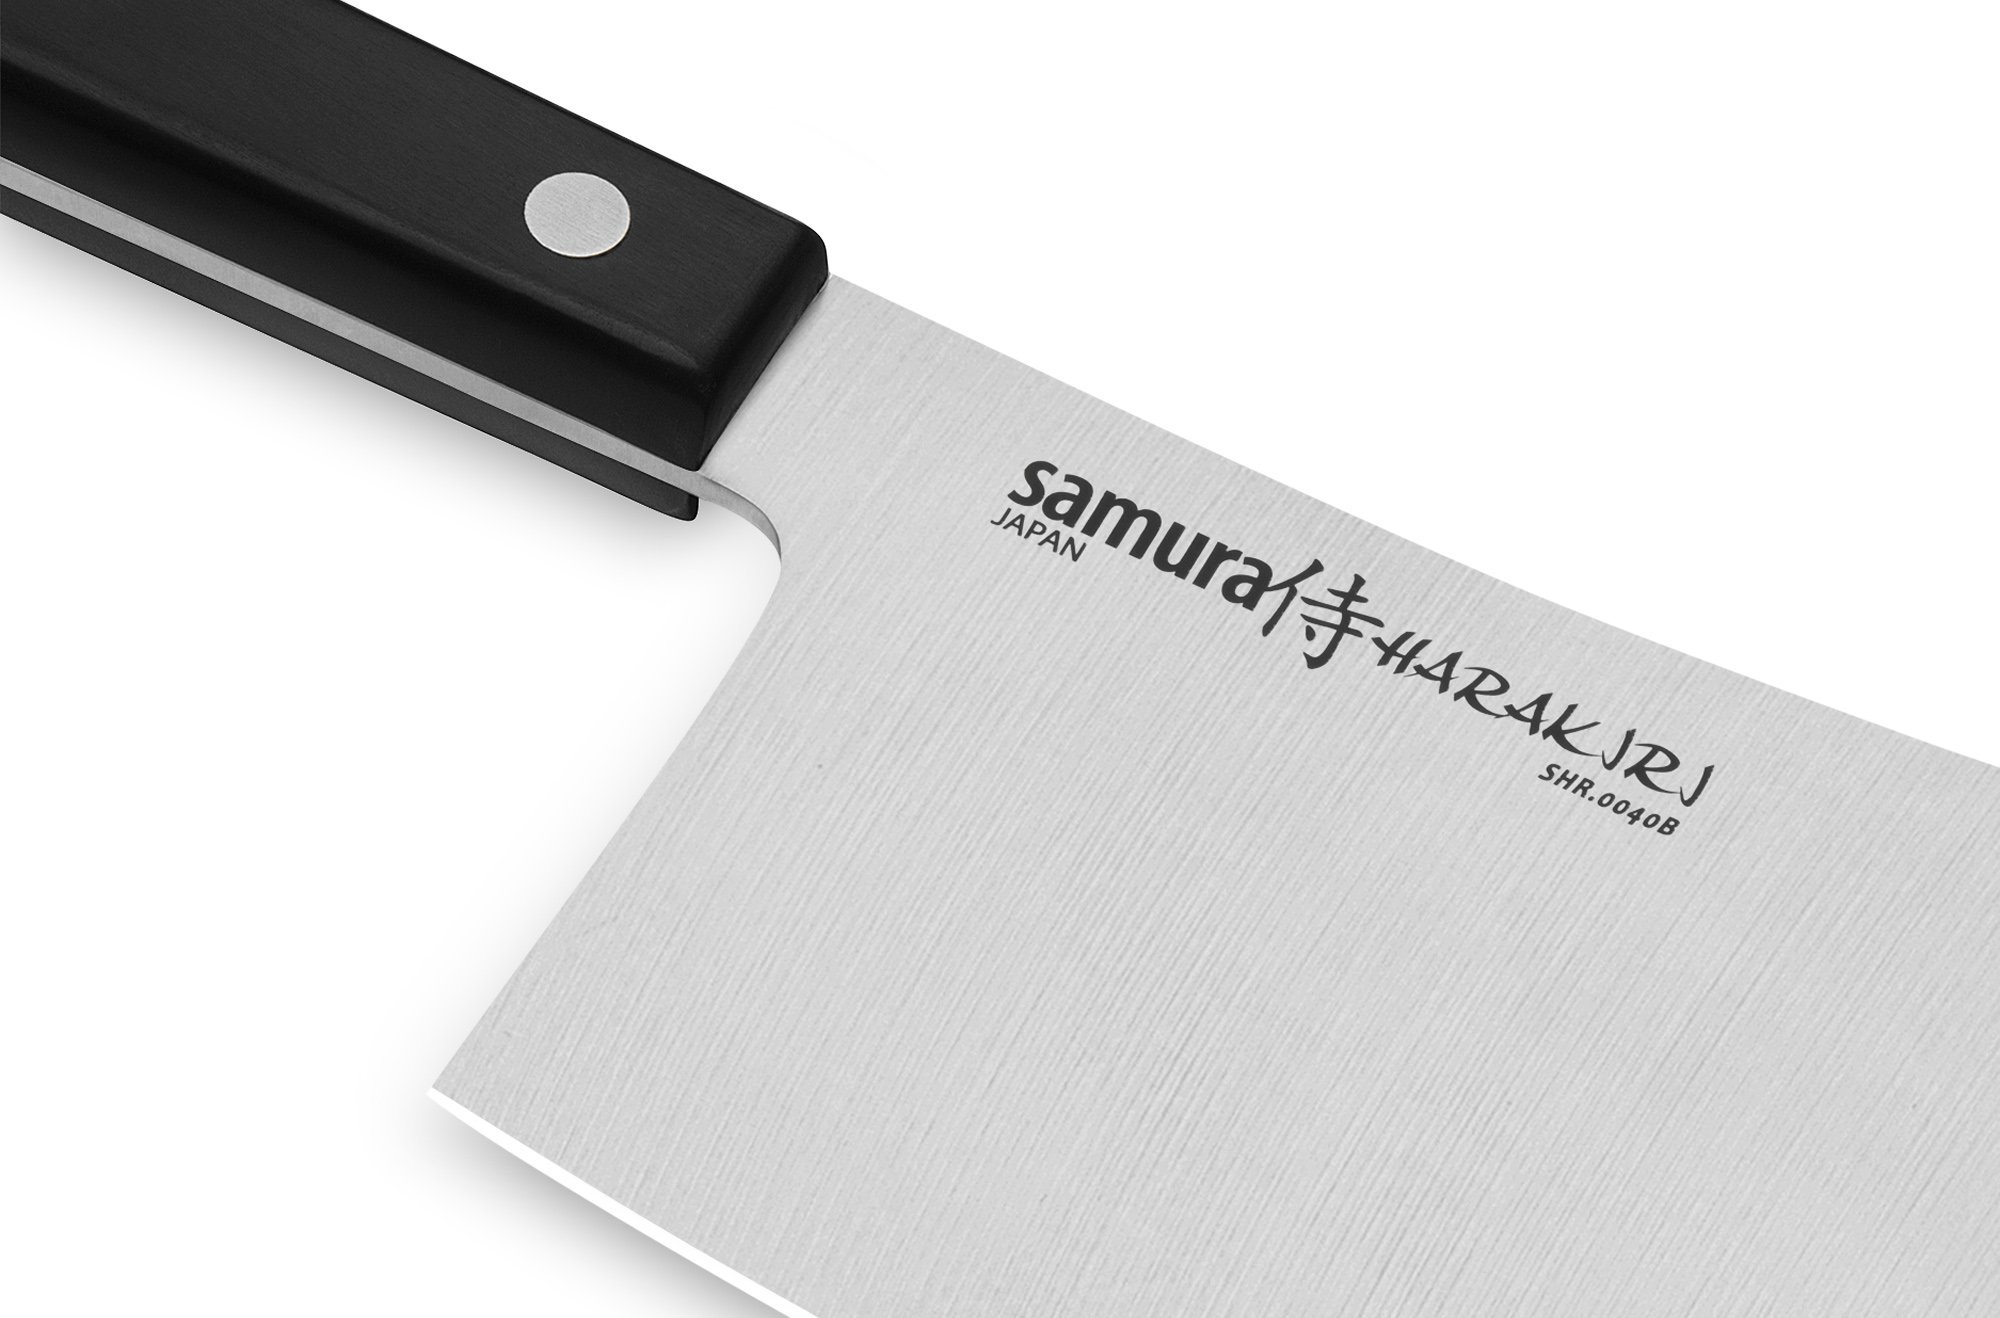 Фото 9 - Нож-топорик кухонный для мяса Samura